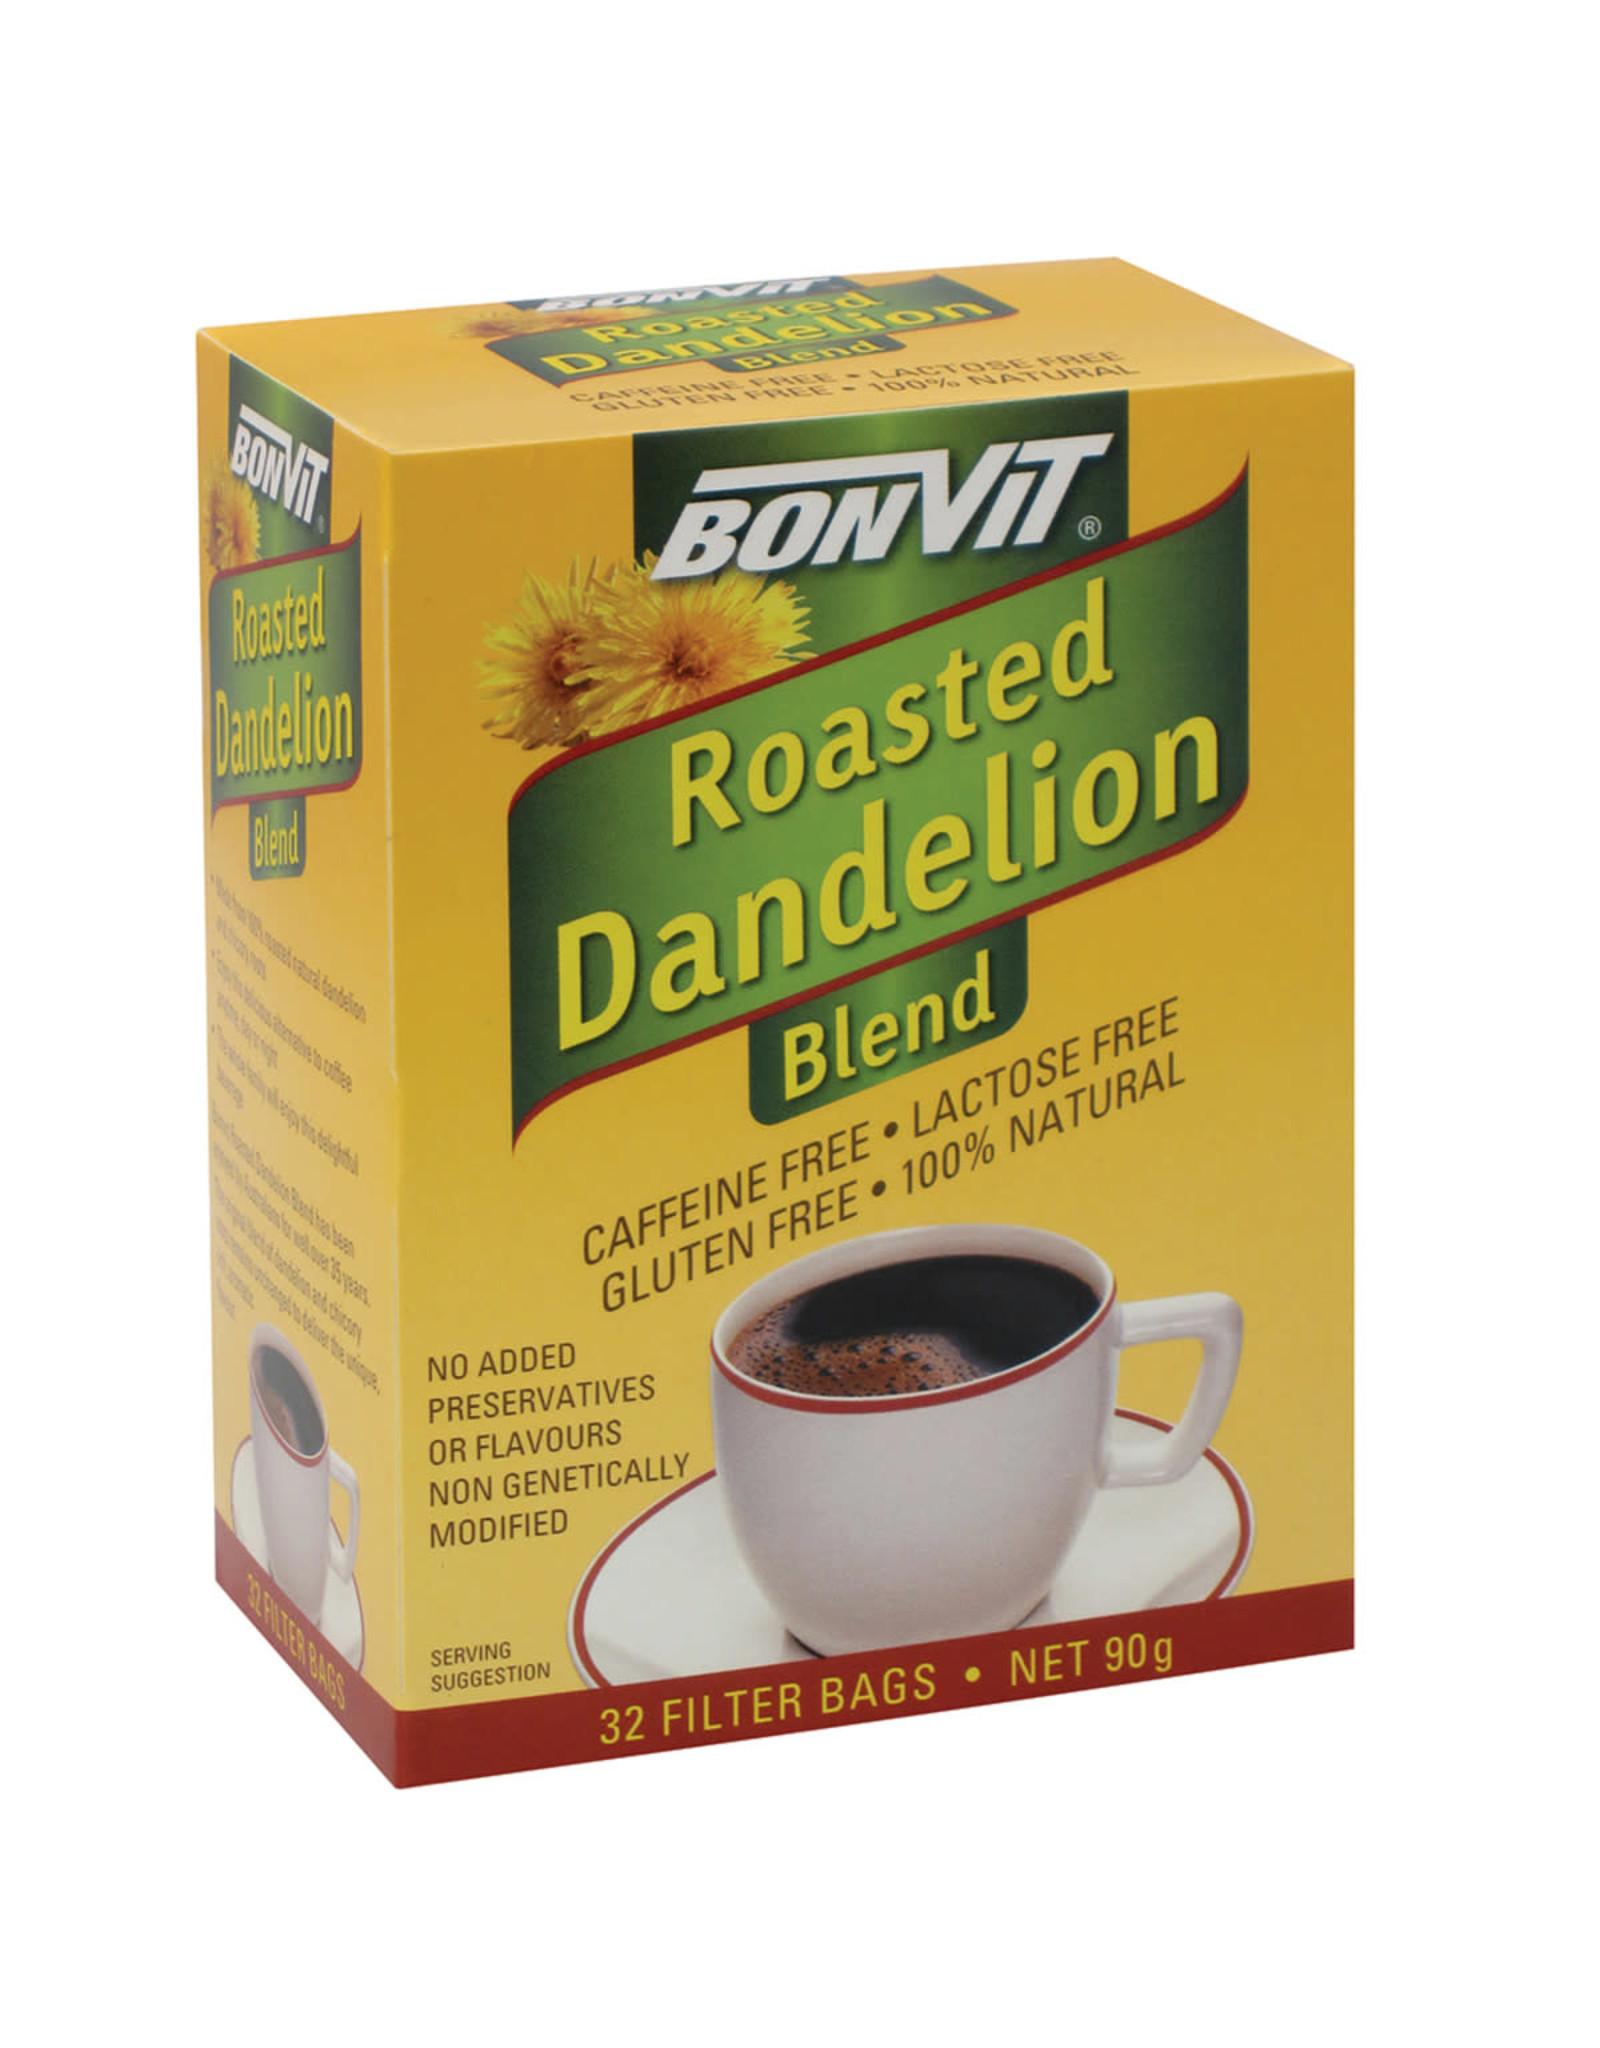 Bonvit Roasted Dandelion Blend Tea x 32 Filter Bags